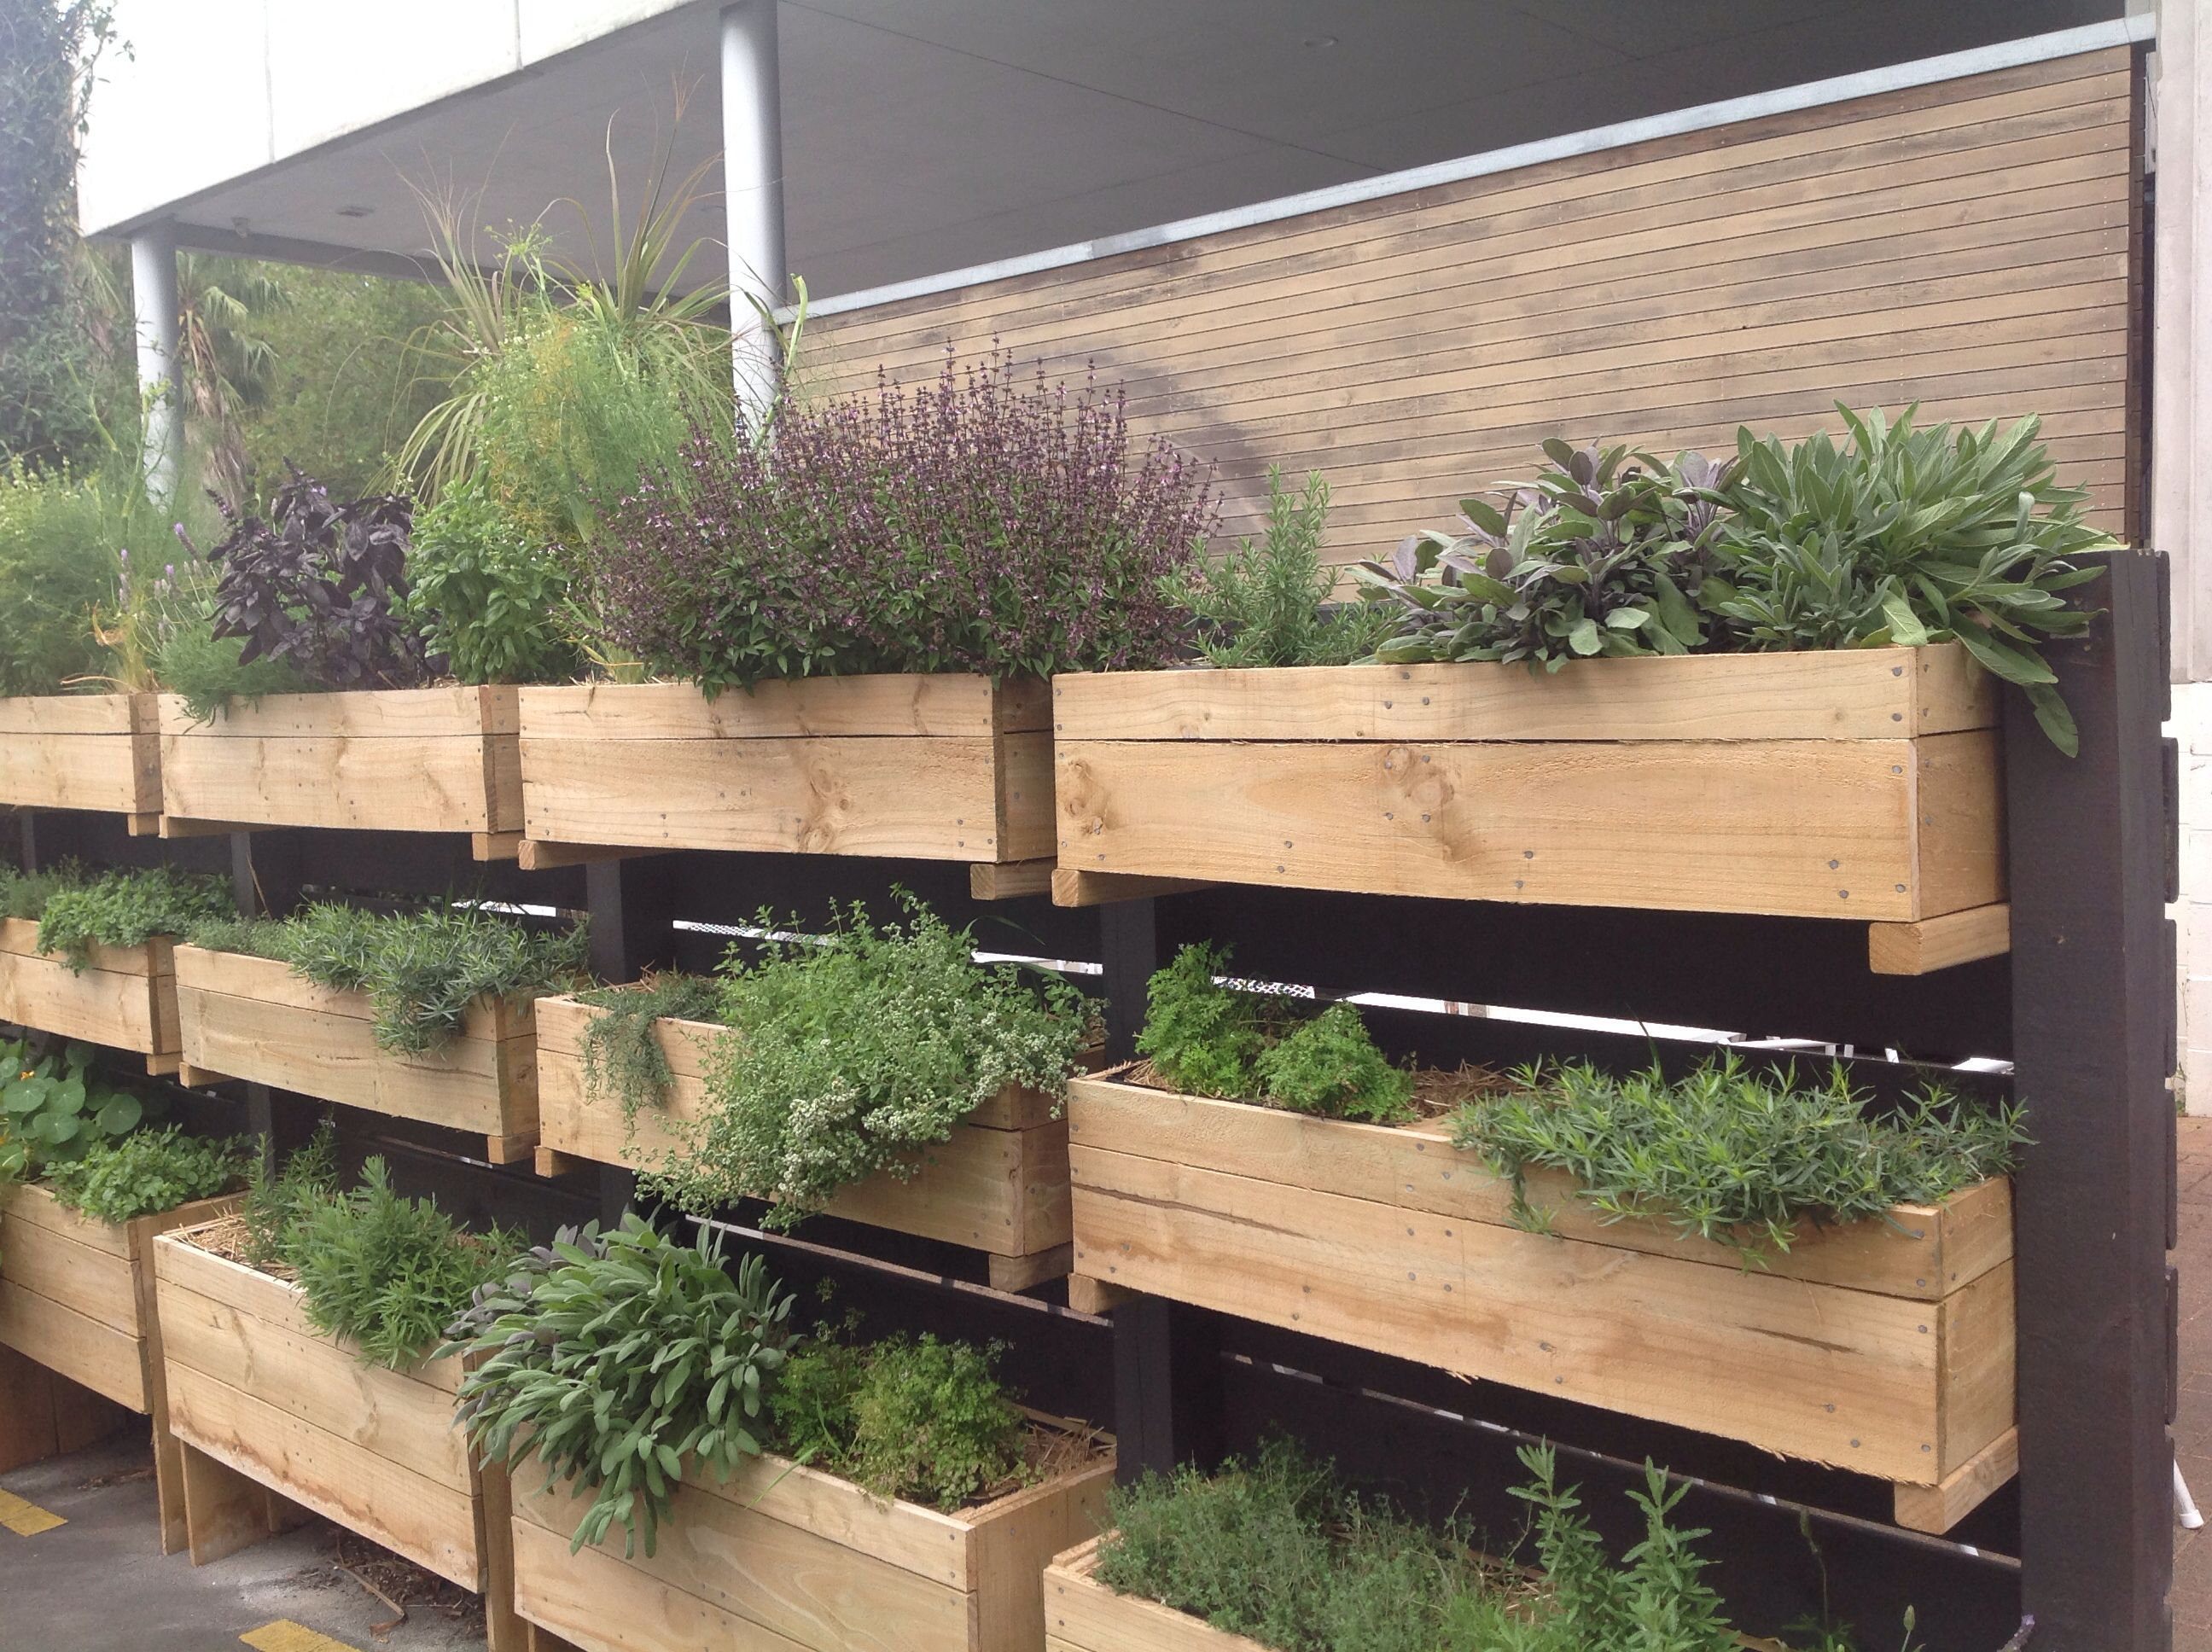 single color planter boxes - Google Search | Planter Boxes ...